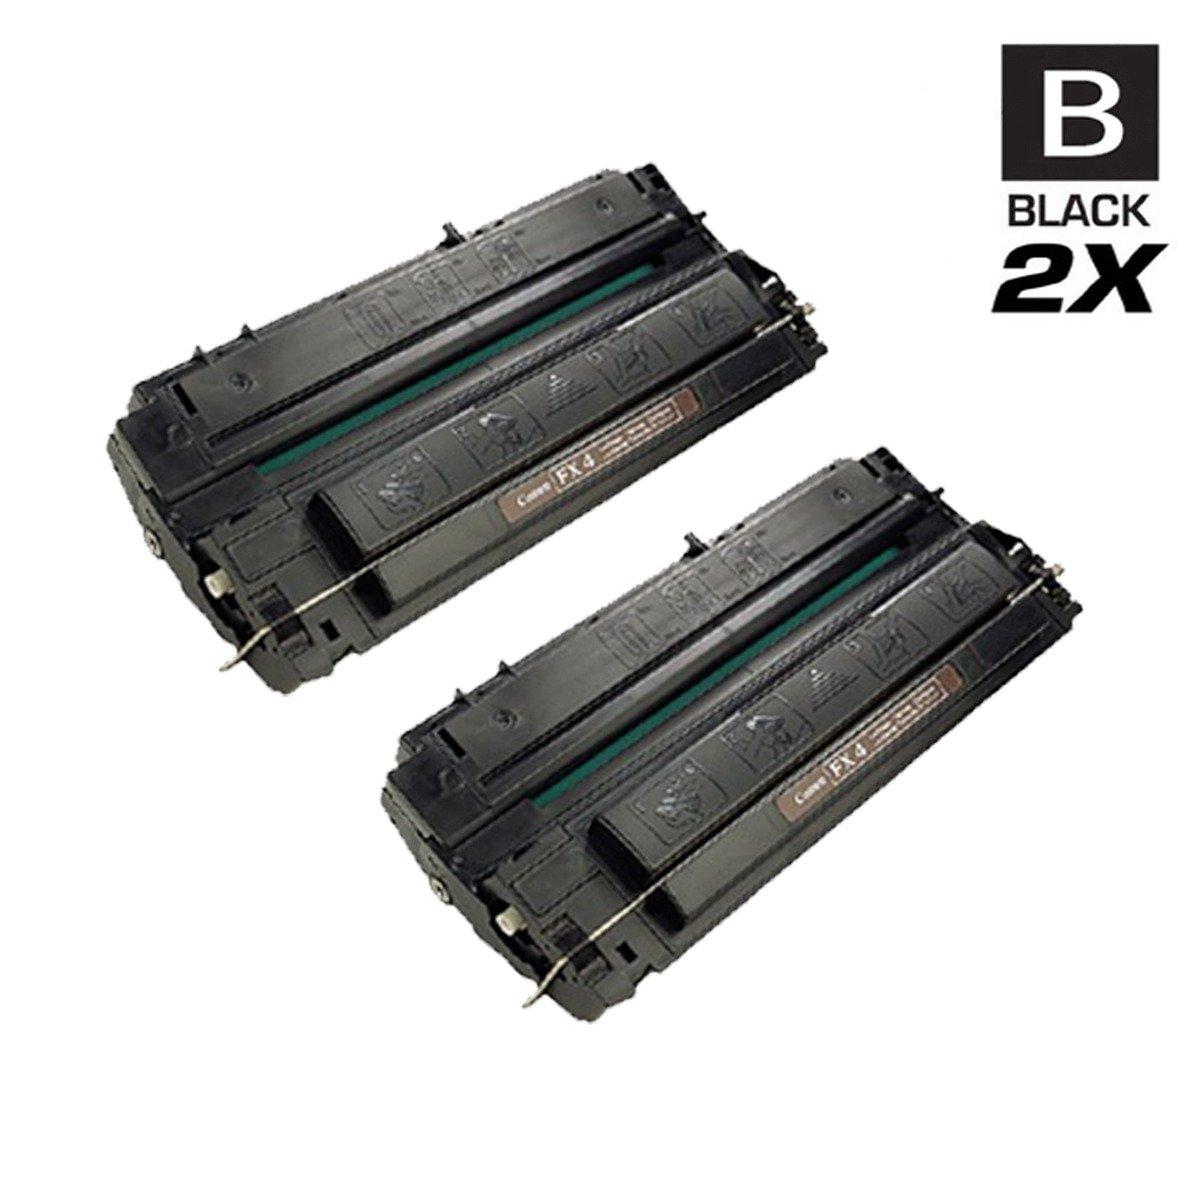 AZ Compatible With Canon FX4 1558A002AA 2 Black Toner Cartridge For FAX L800 L900 LaserClass 8500 9000 9000L